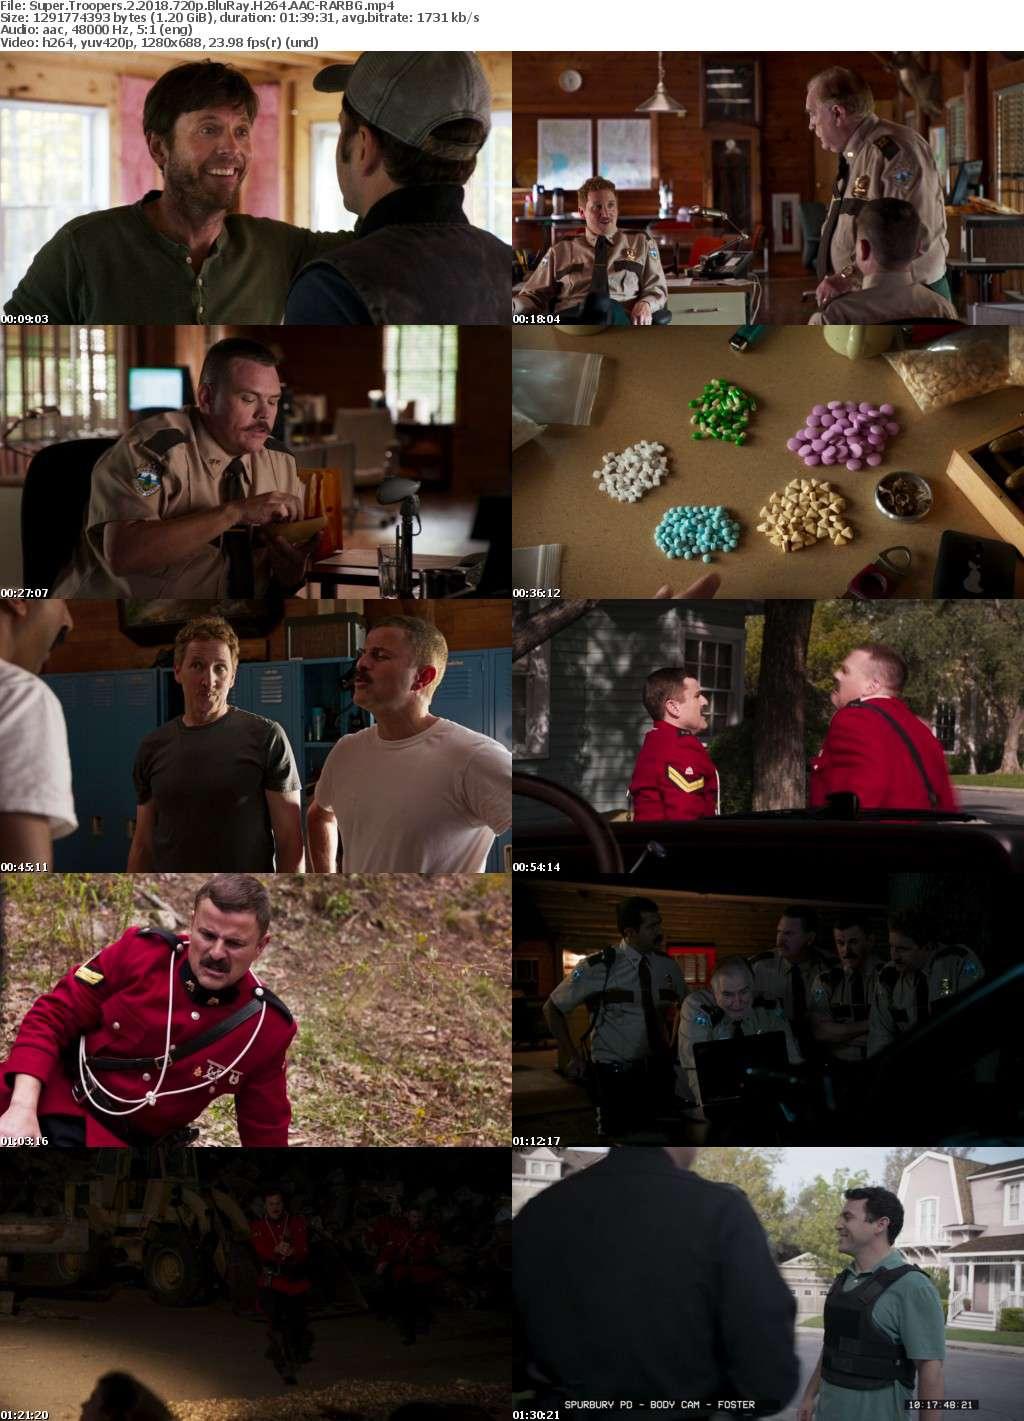 Super Troopers 2 2018 720p BluRay H264 AAC-RARBG